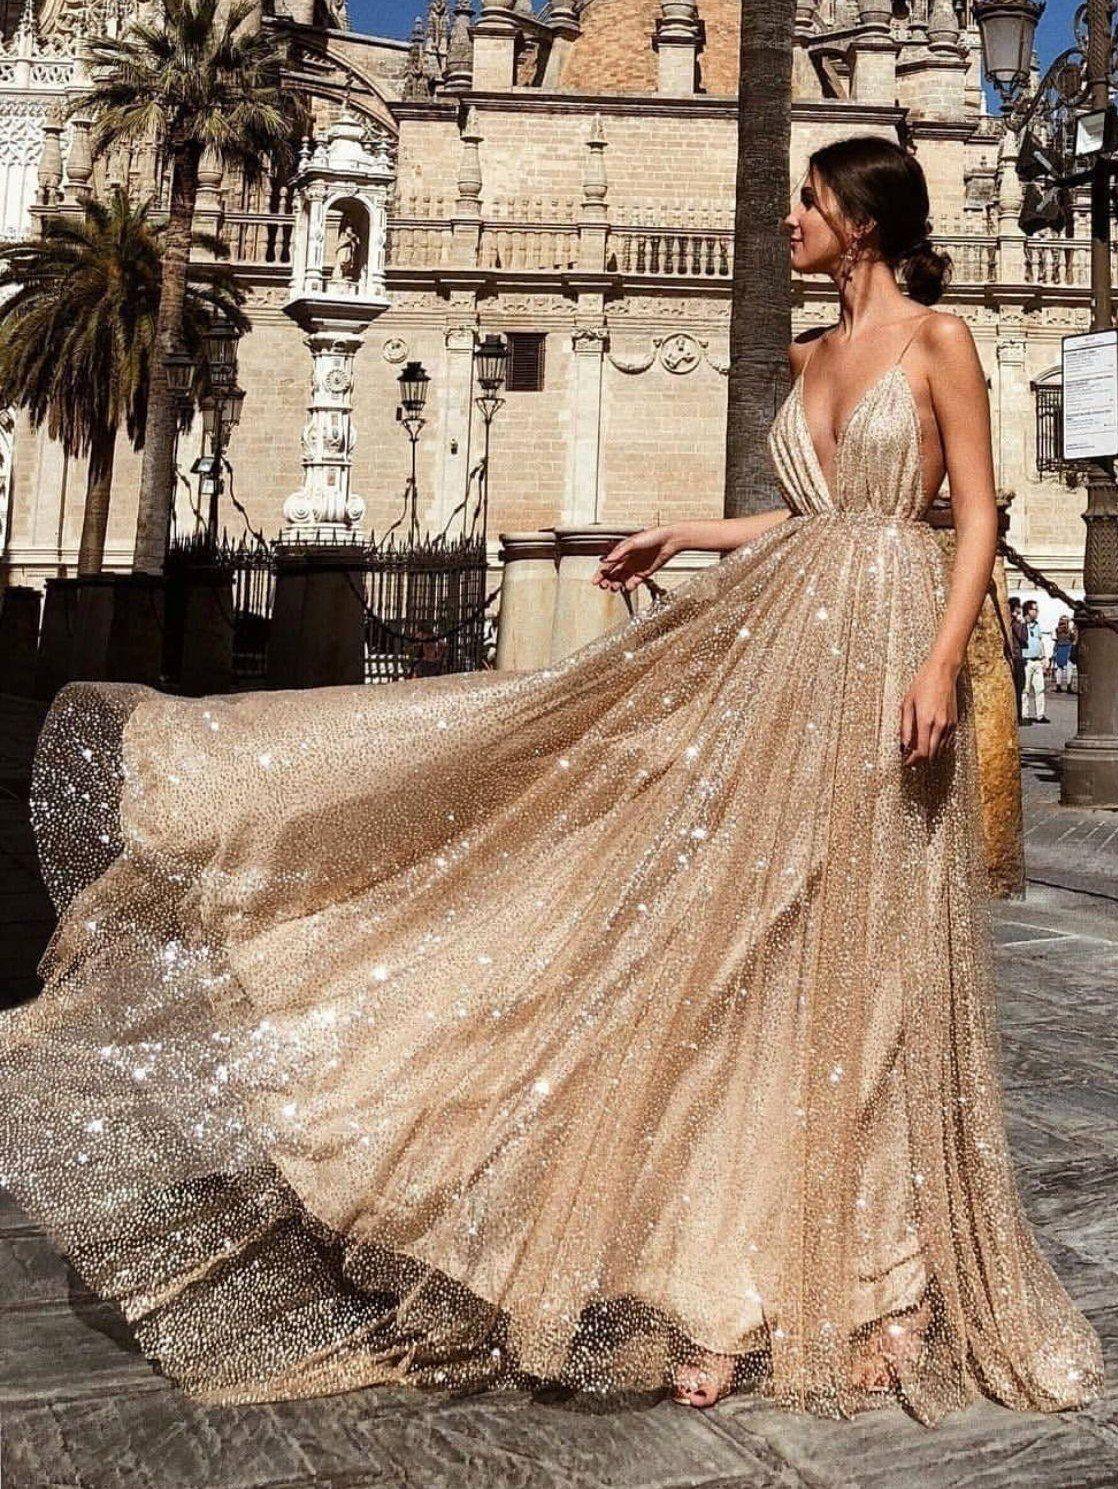 e4f3c8ebc5 Sexy Gold V Neck Sequined Maxi Dresses  shopforselection  beautiful   bohemia  cute  clothing  design  life  amazing  happy  style